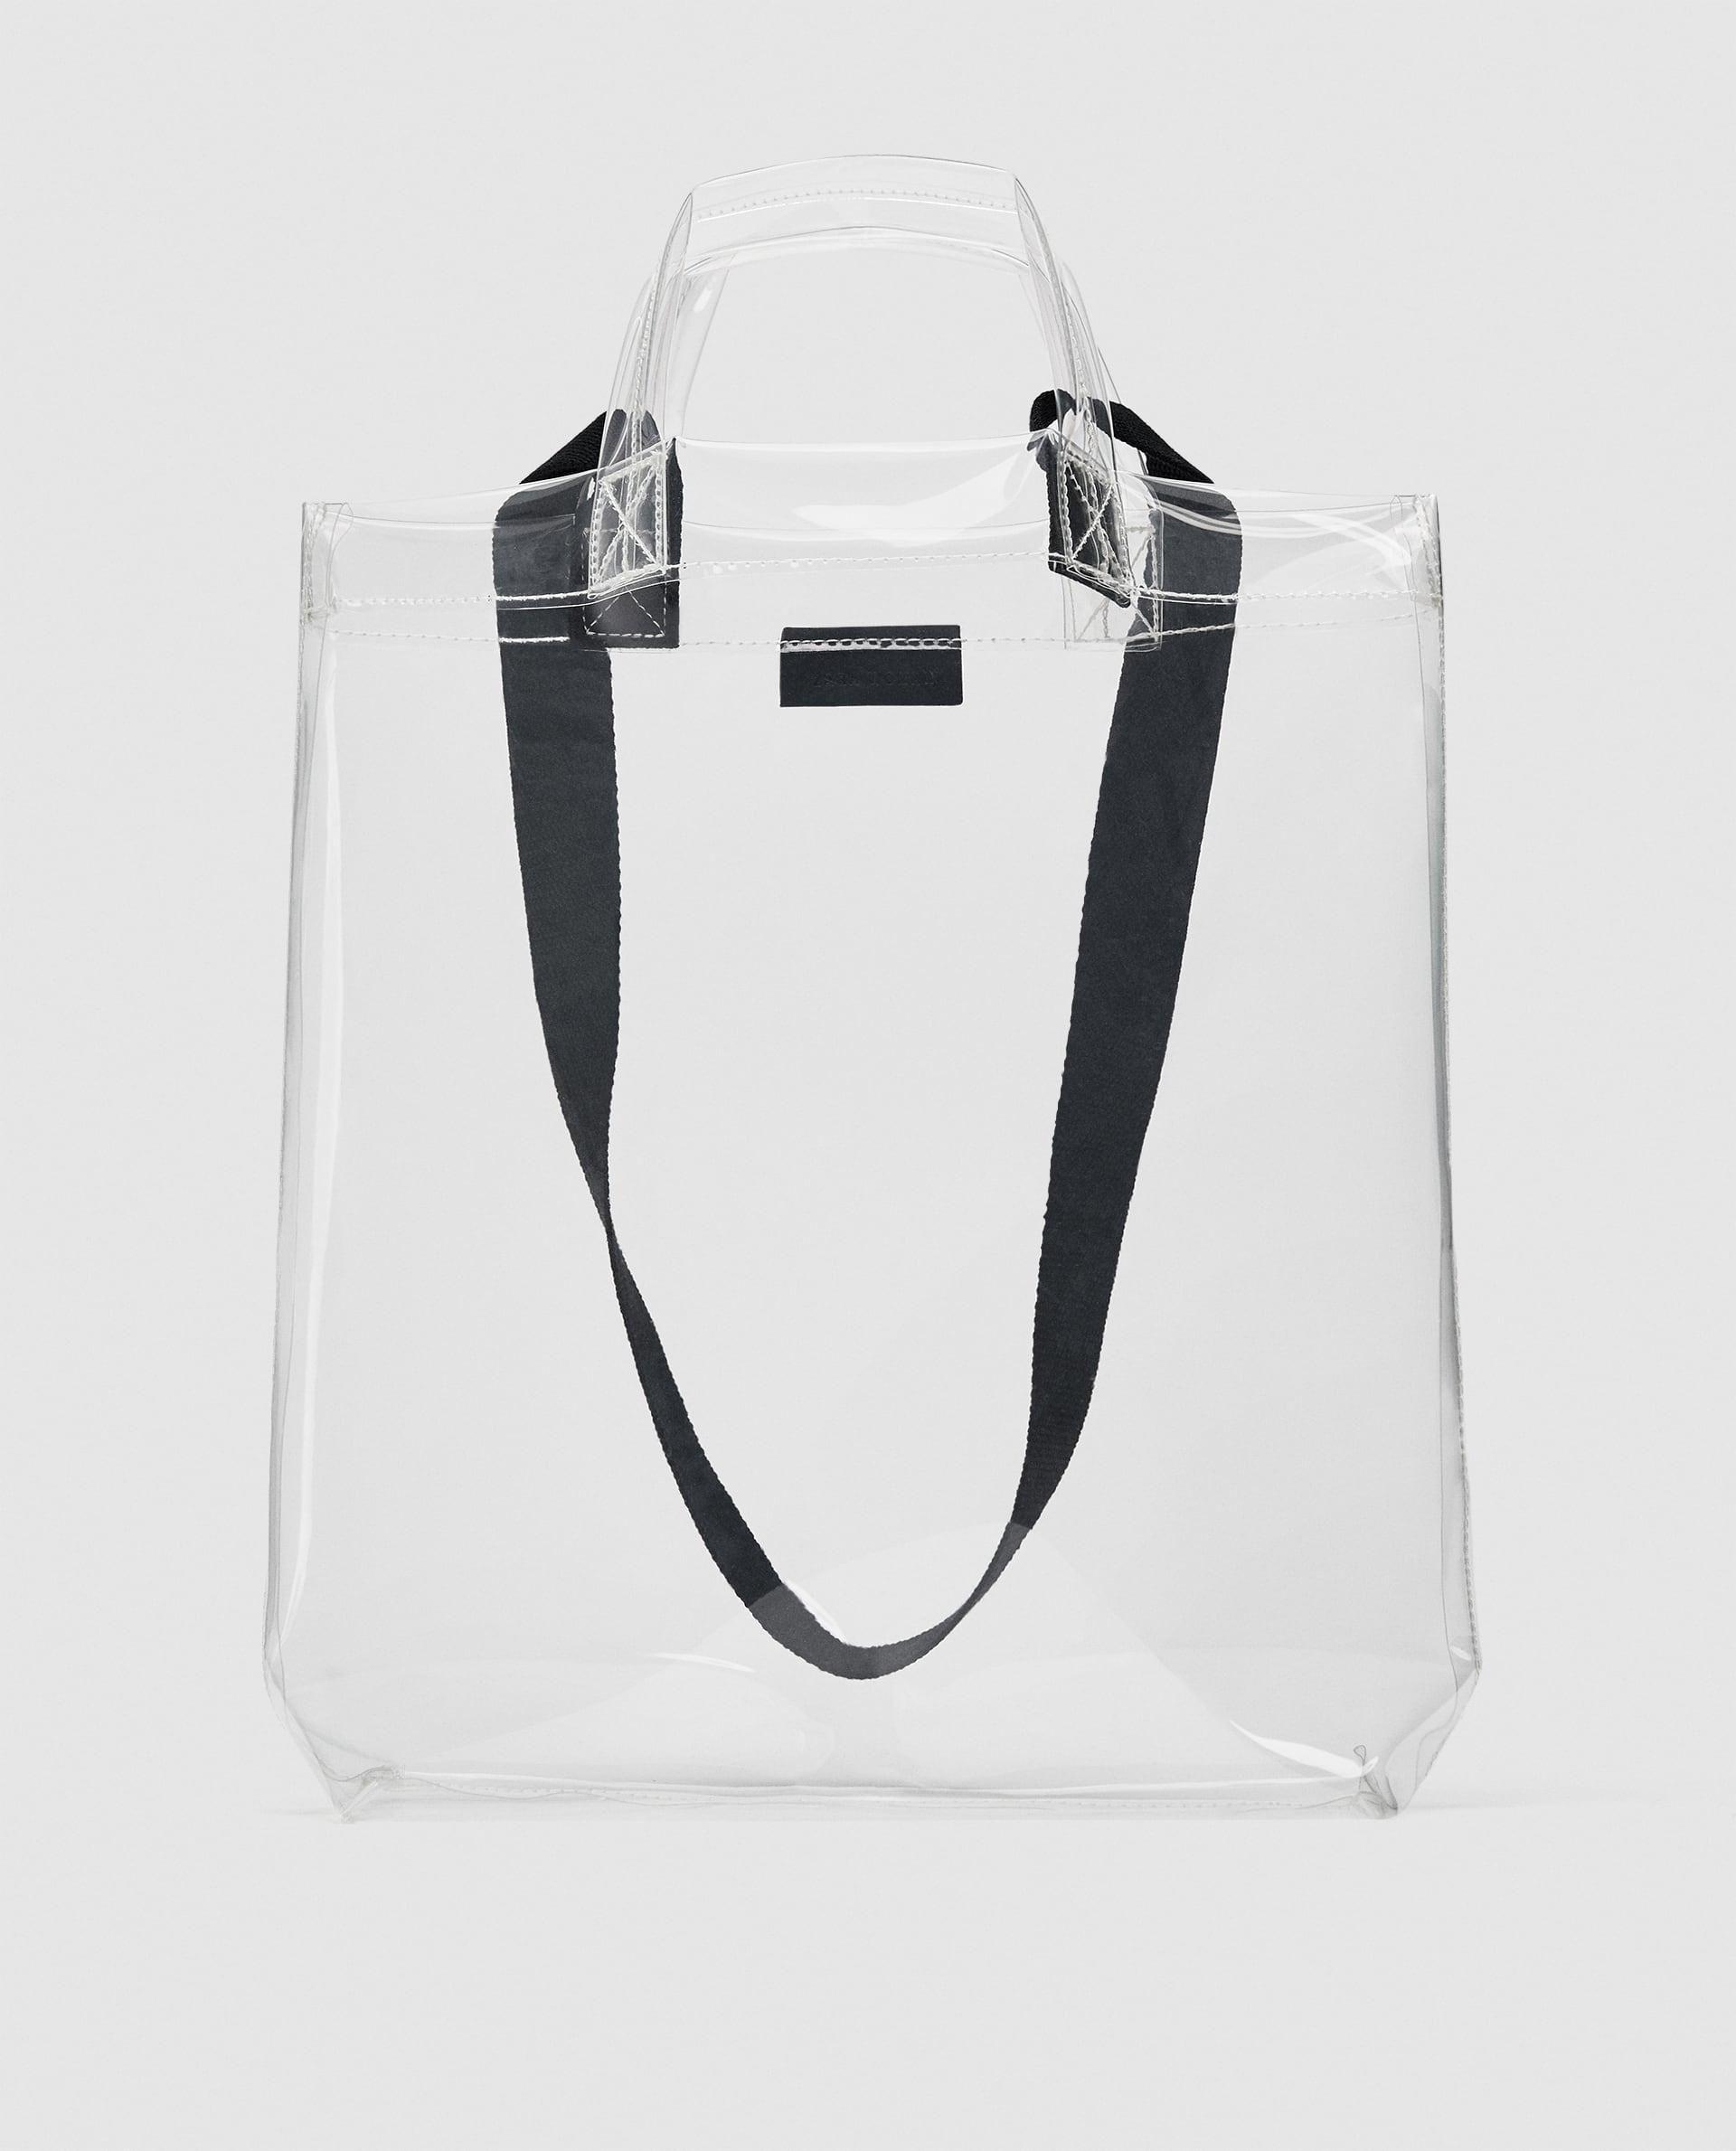 Vinyl Tote Bag 25 90 Usd Zara Transparent Tote Bag With Handles Fabric Shoulder Straps Height X Width X Depth 38 X 34 X 4 C Bags Zara Bags Tote Bag